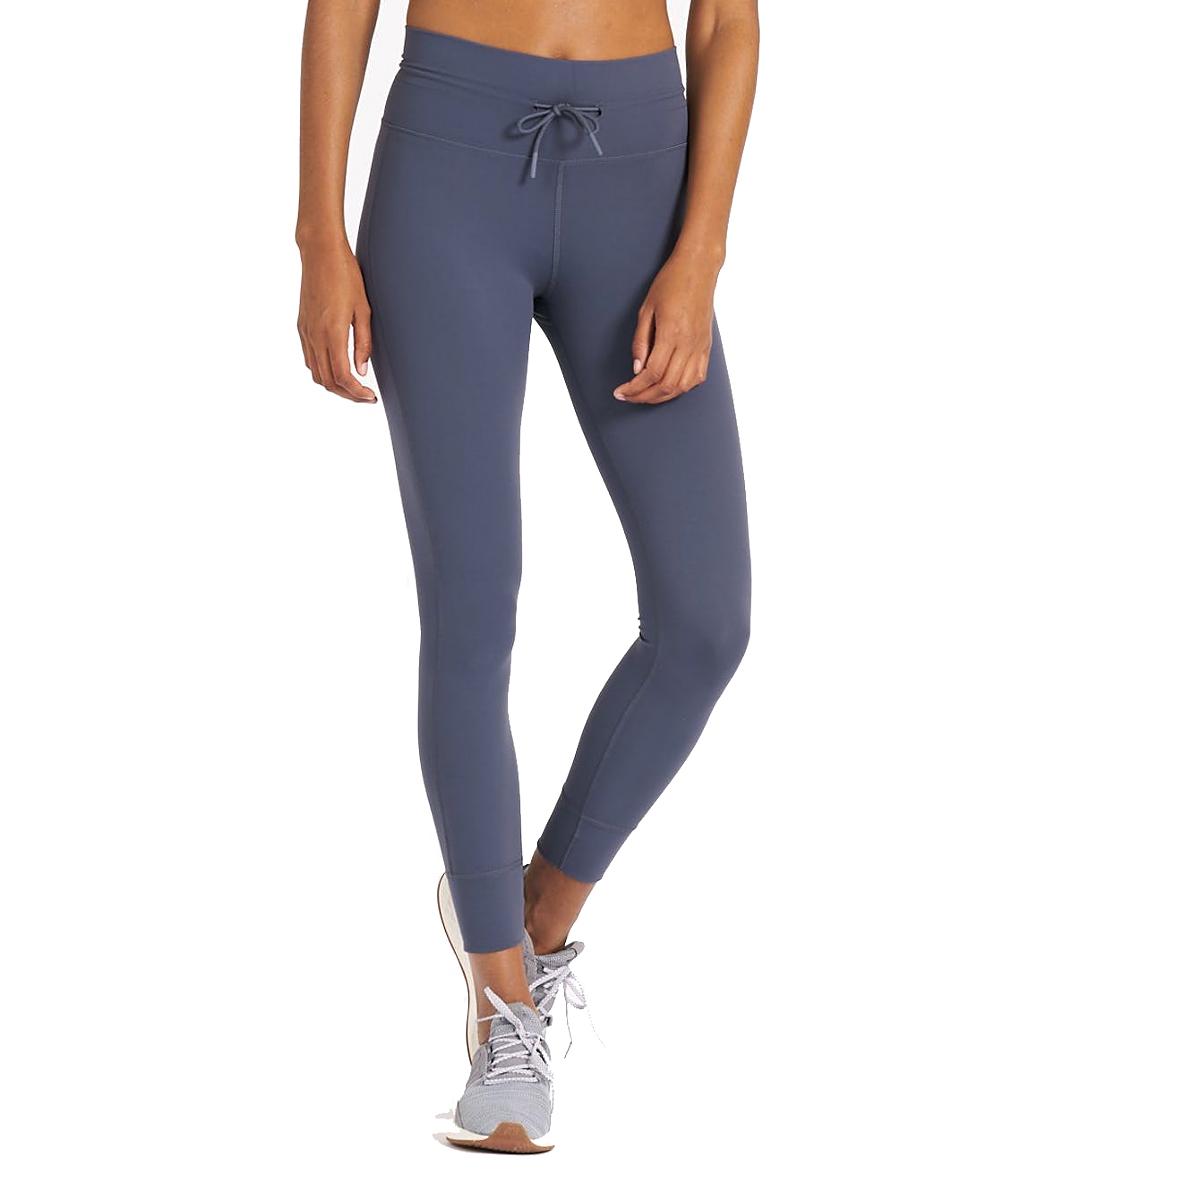 Women's Vuori Daily Legging  - Color: Ocean - Size: M, Ocean, large, image 1